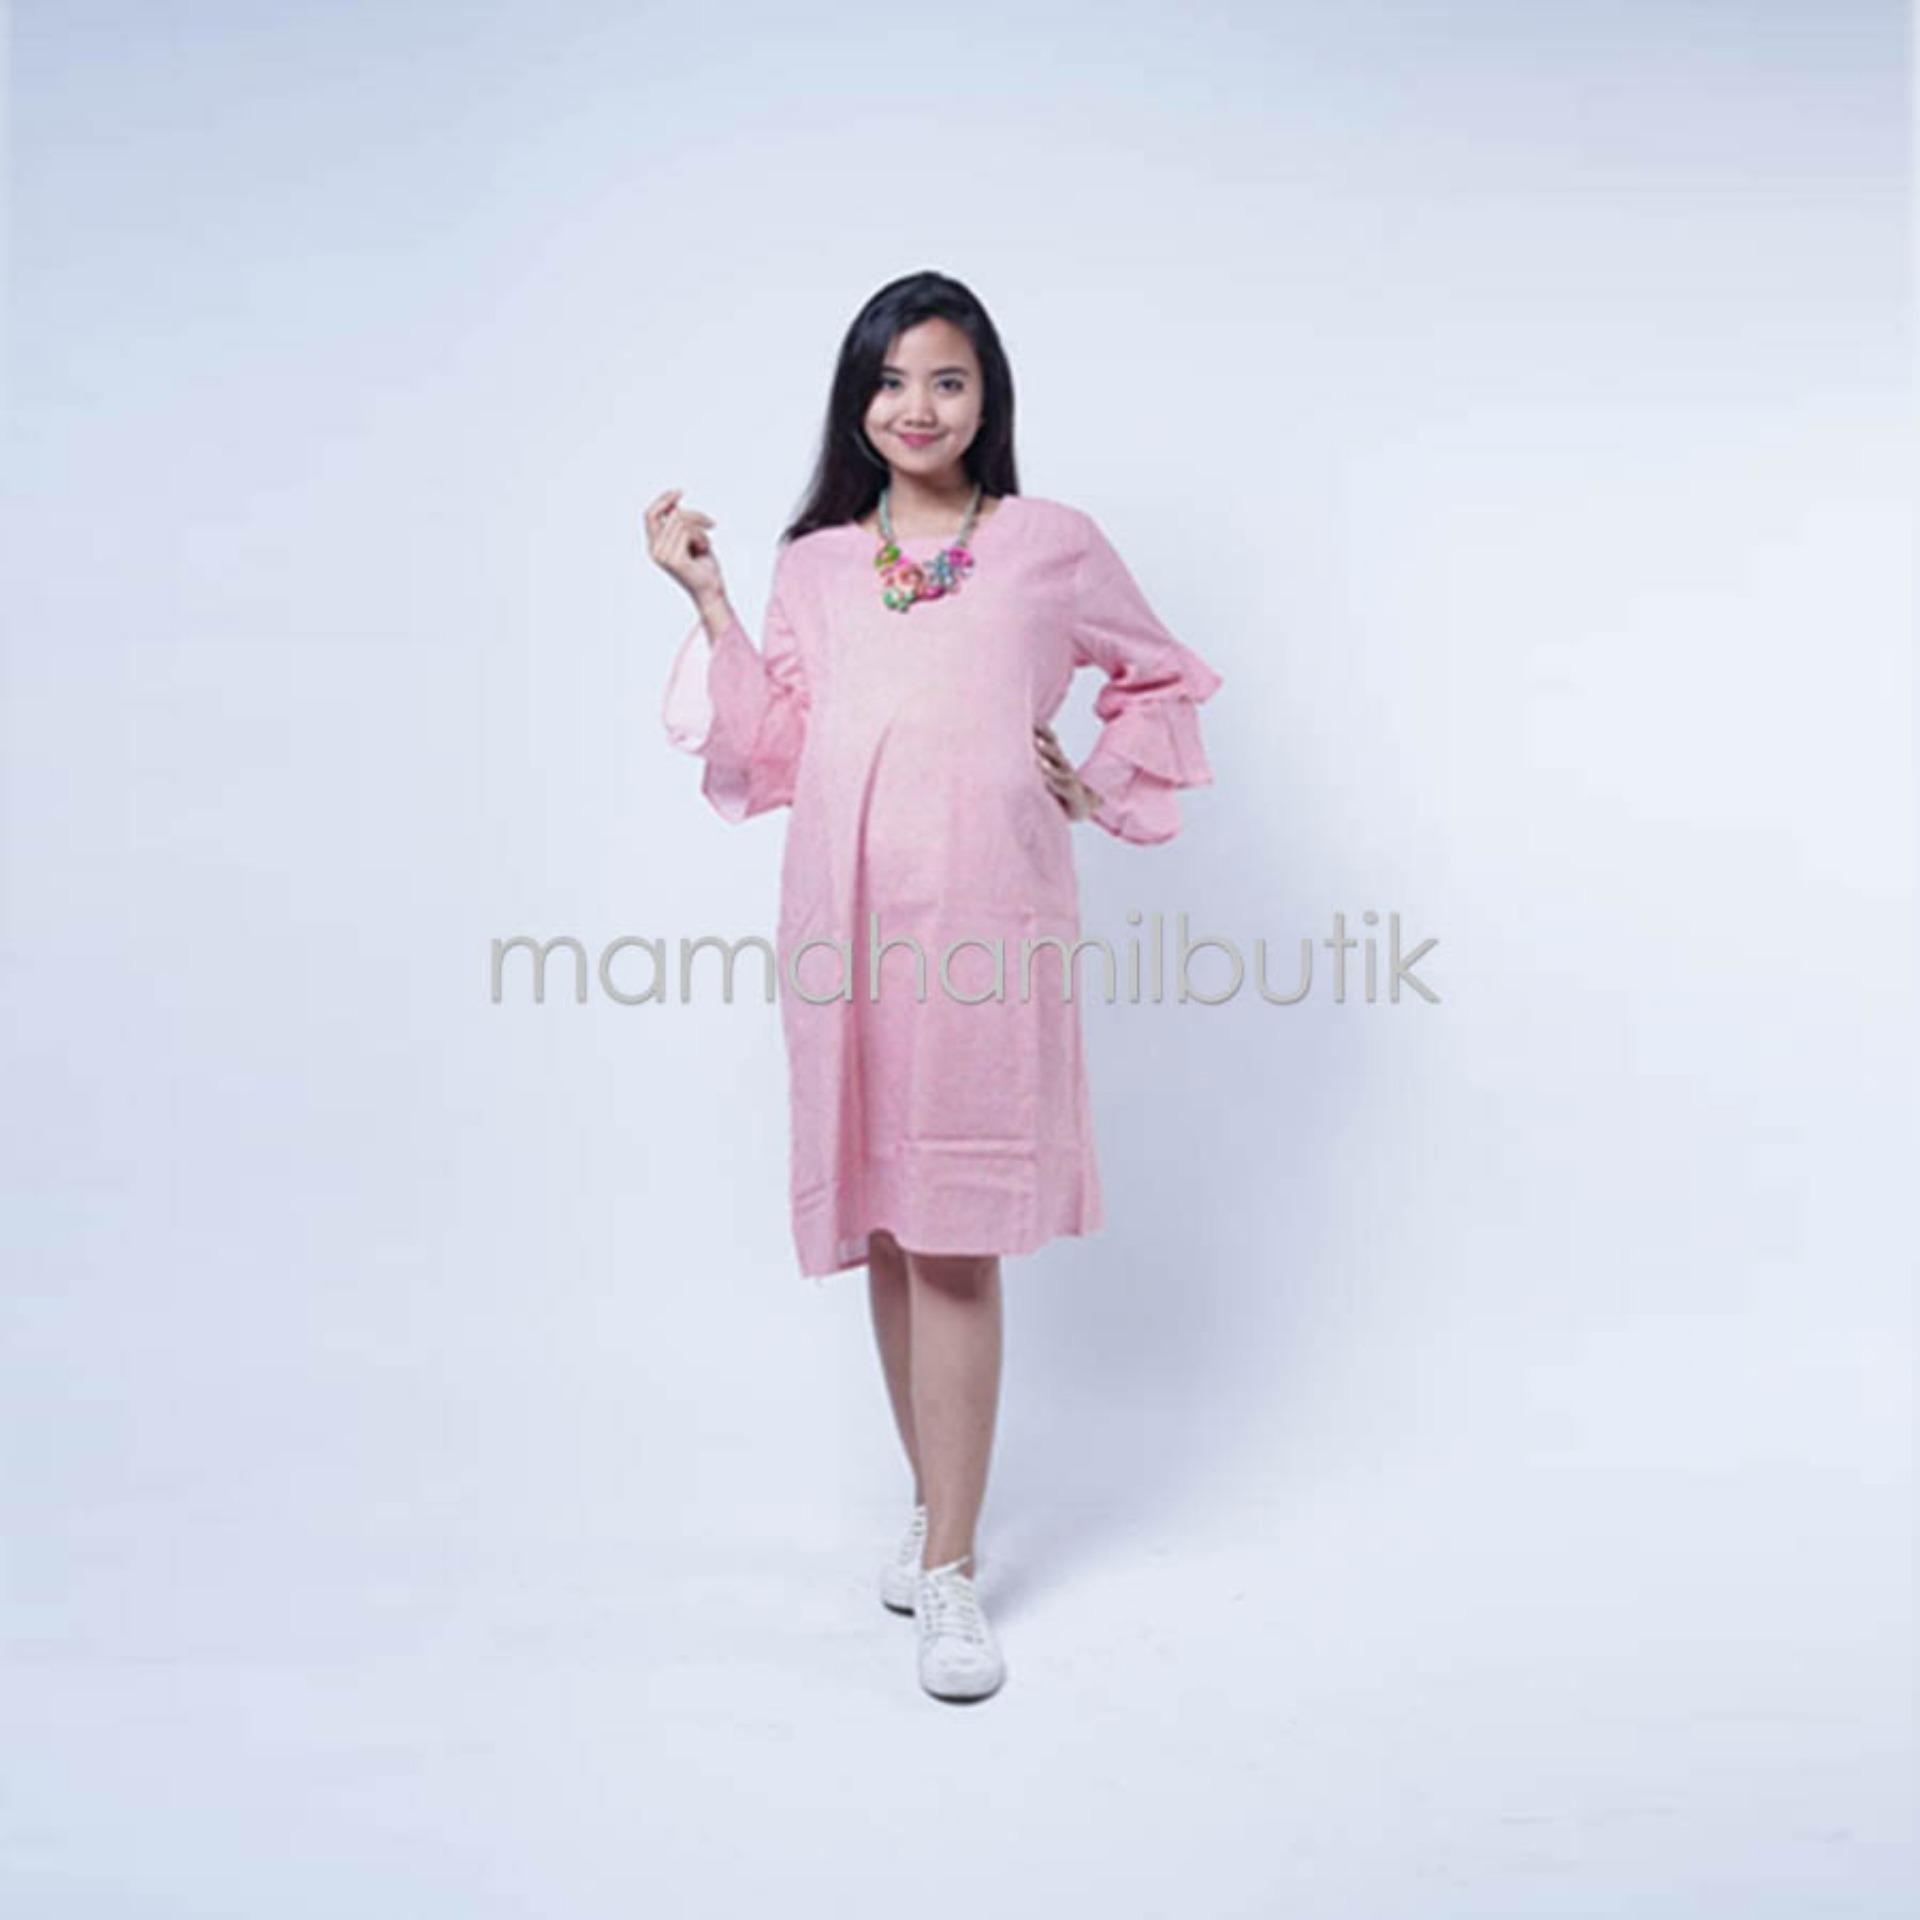 Panjang Lengan : 43 cm FREE CD Hamil Mama Hamil Baju Hamil Dress Hamil Kotak Layer